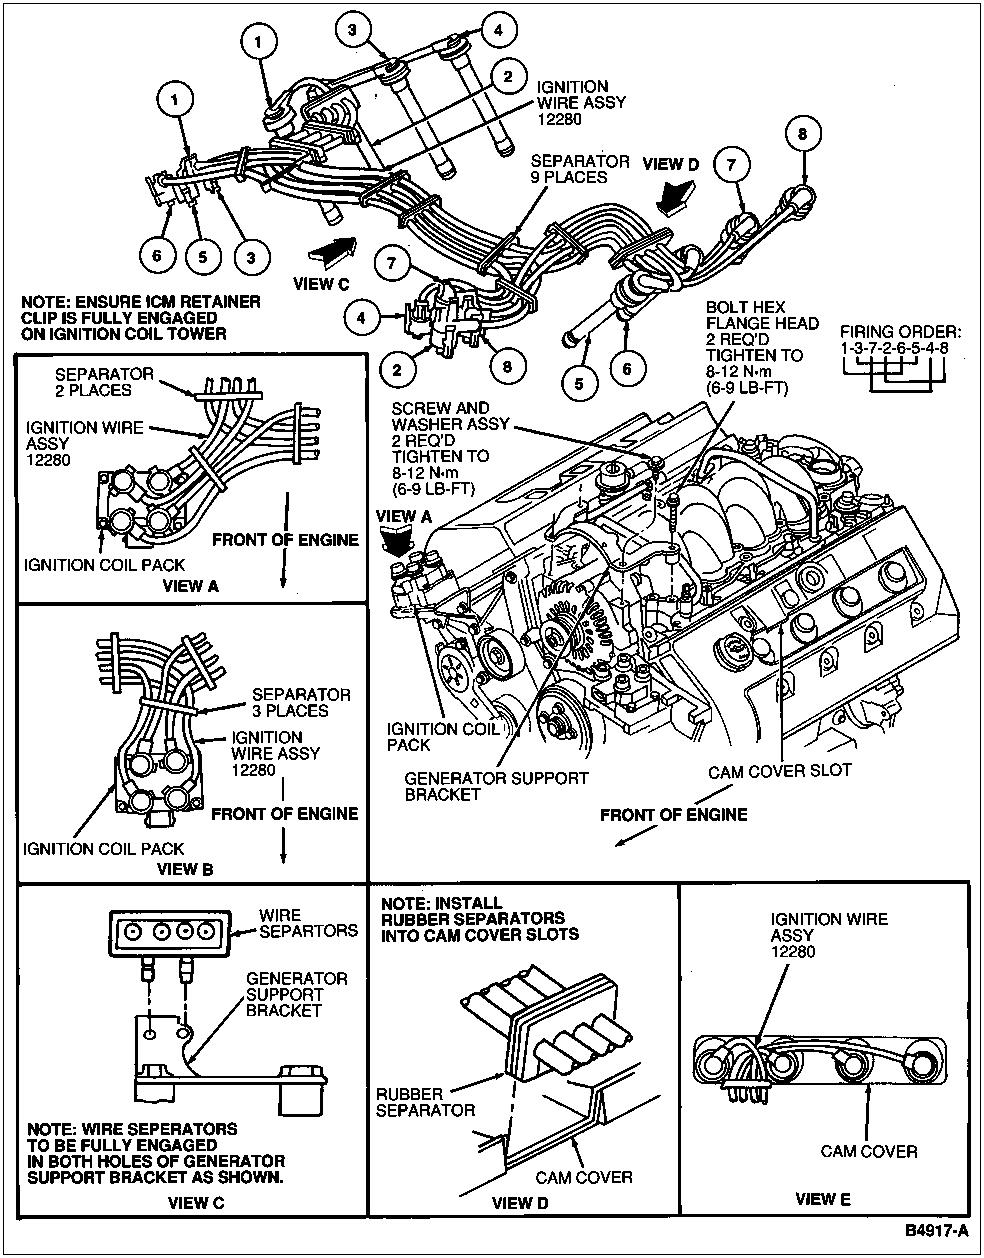 hight resolution of 2003 mustang 3 8 engine imrc diagram